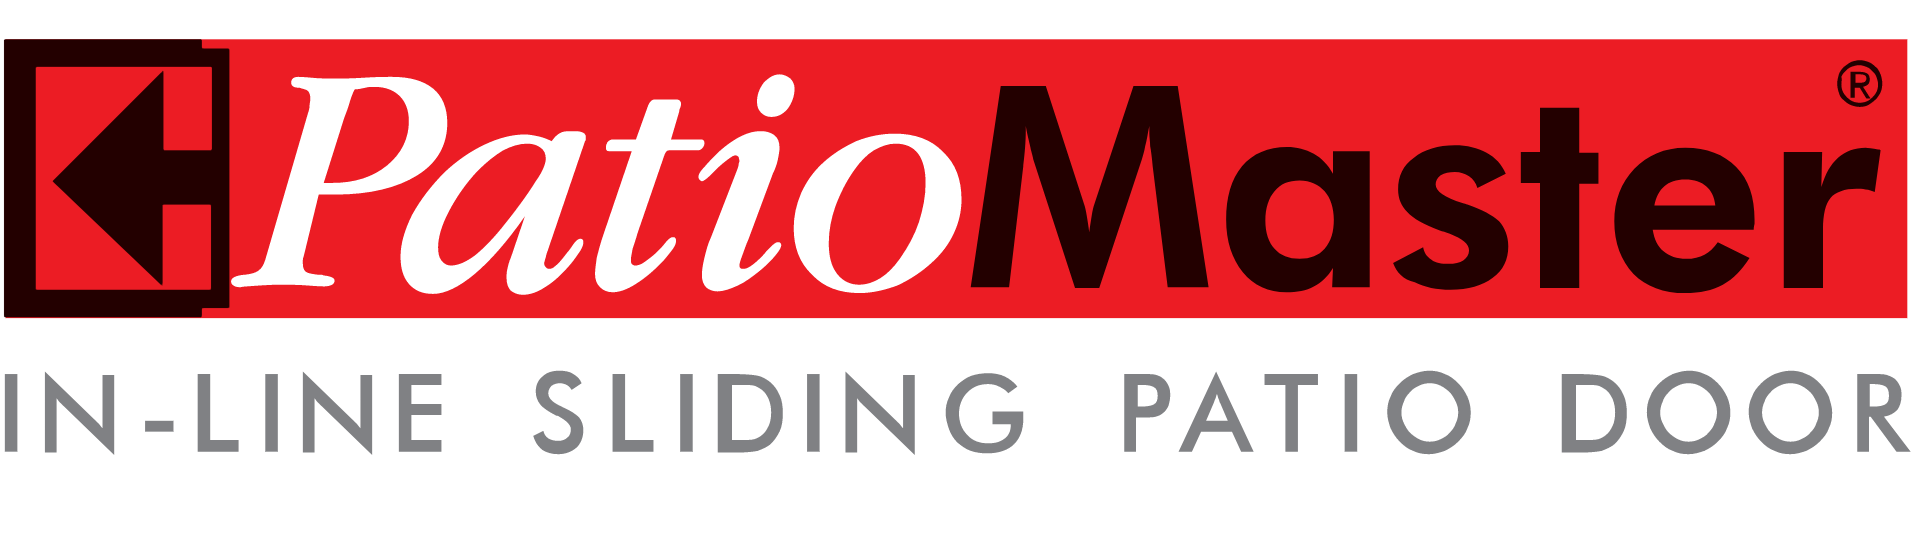 Patiomaster logo